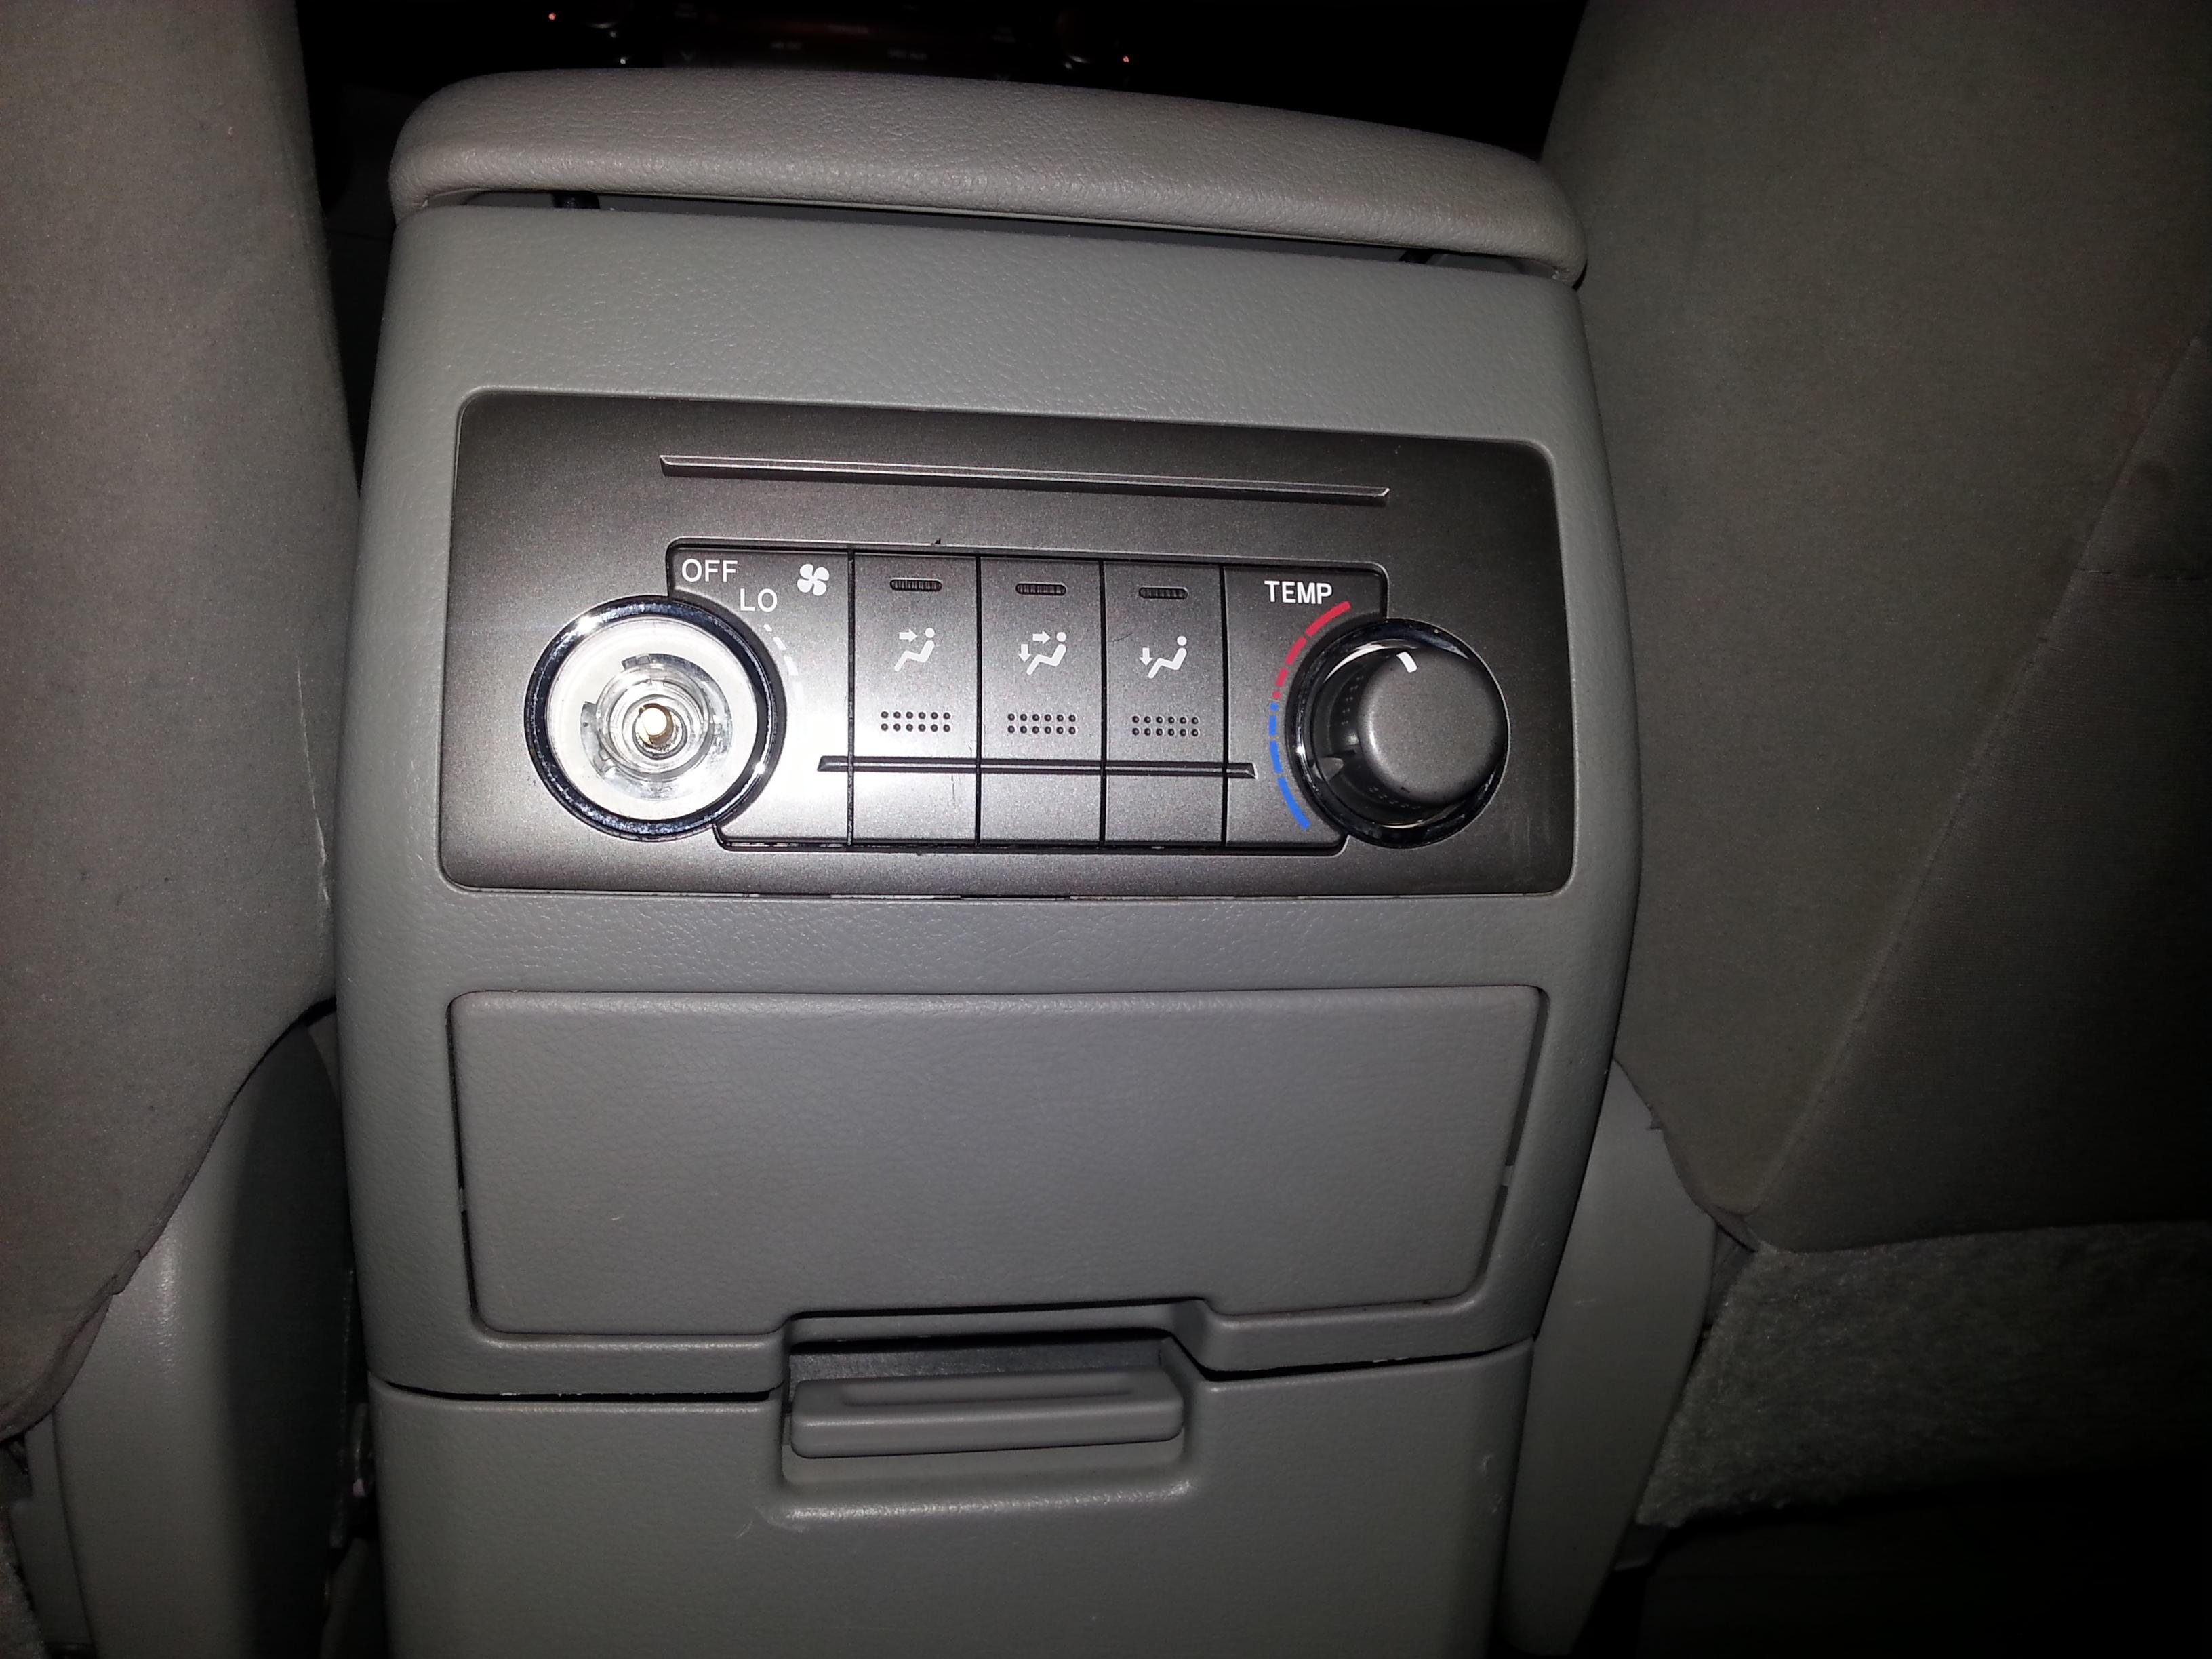 2010 Highlander Rear Temperature Control Knob Toyota